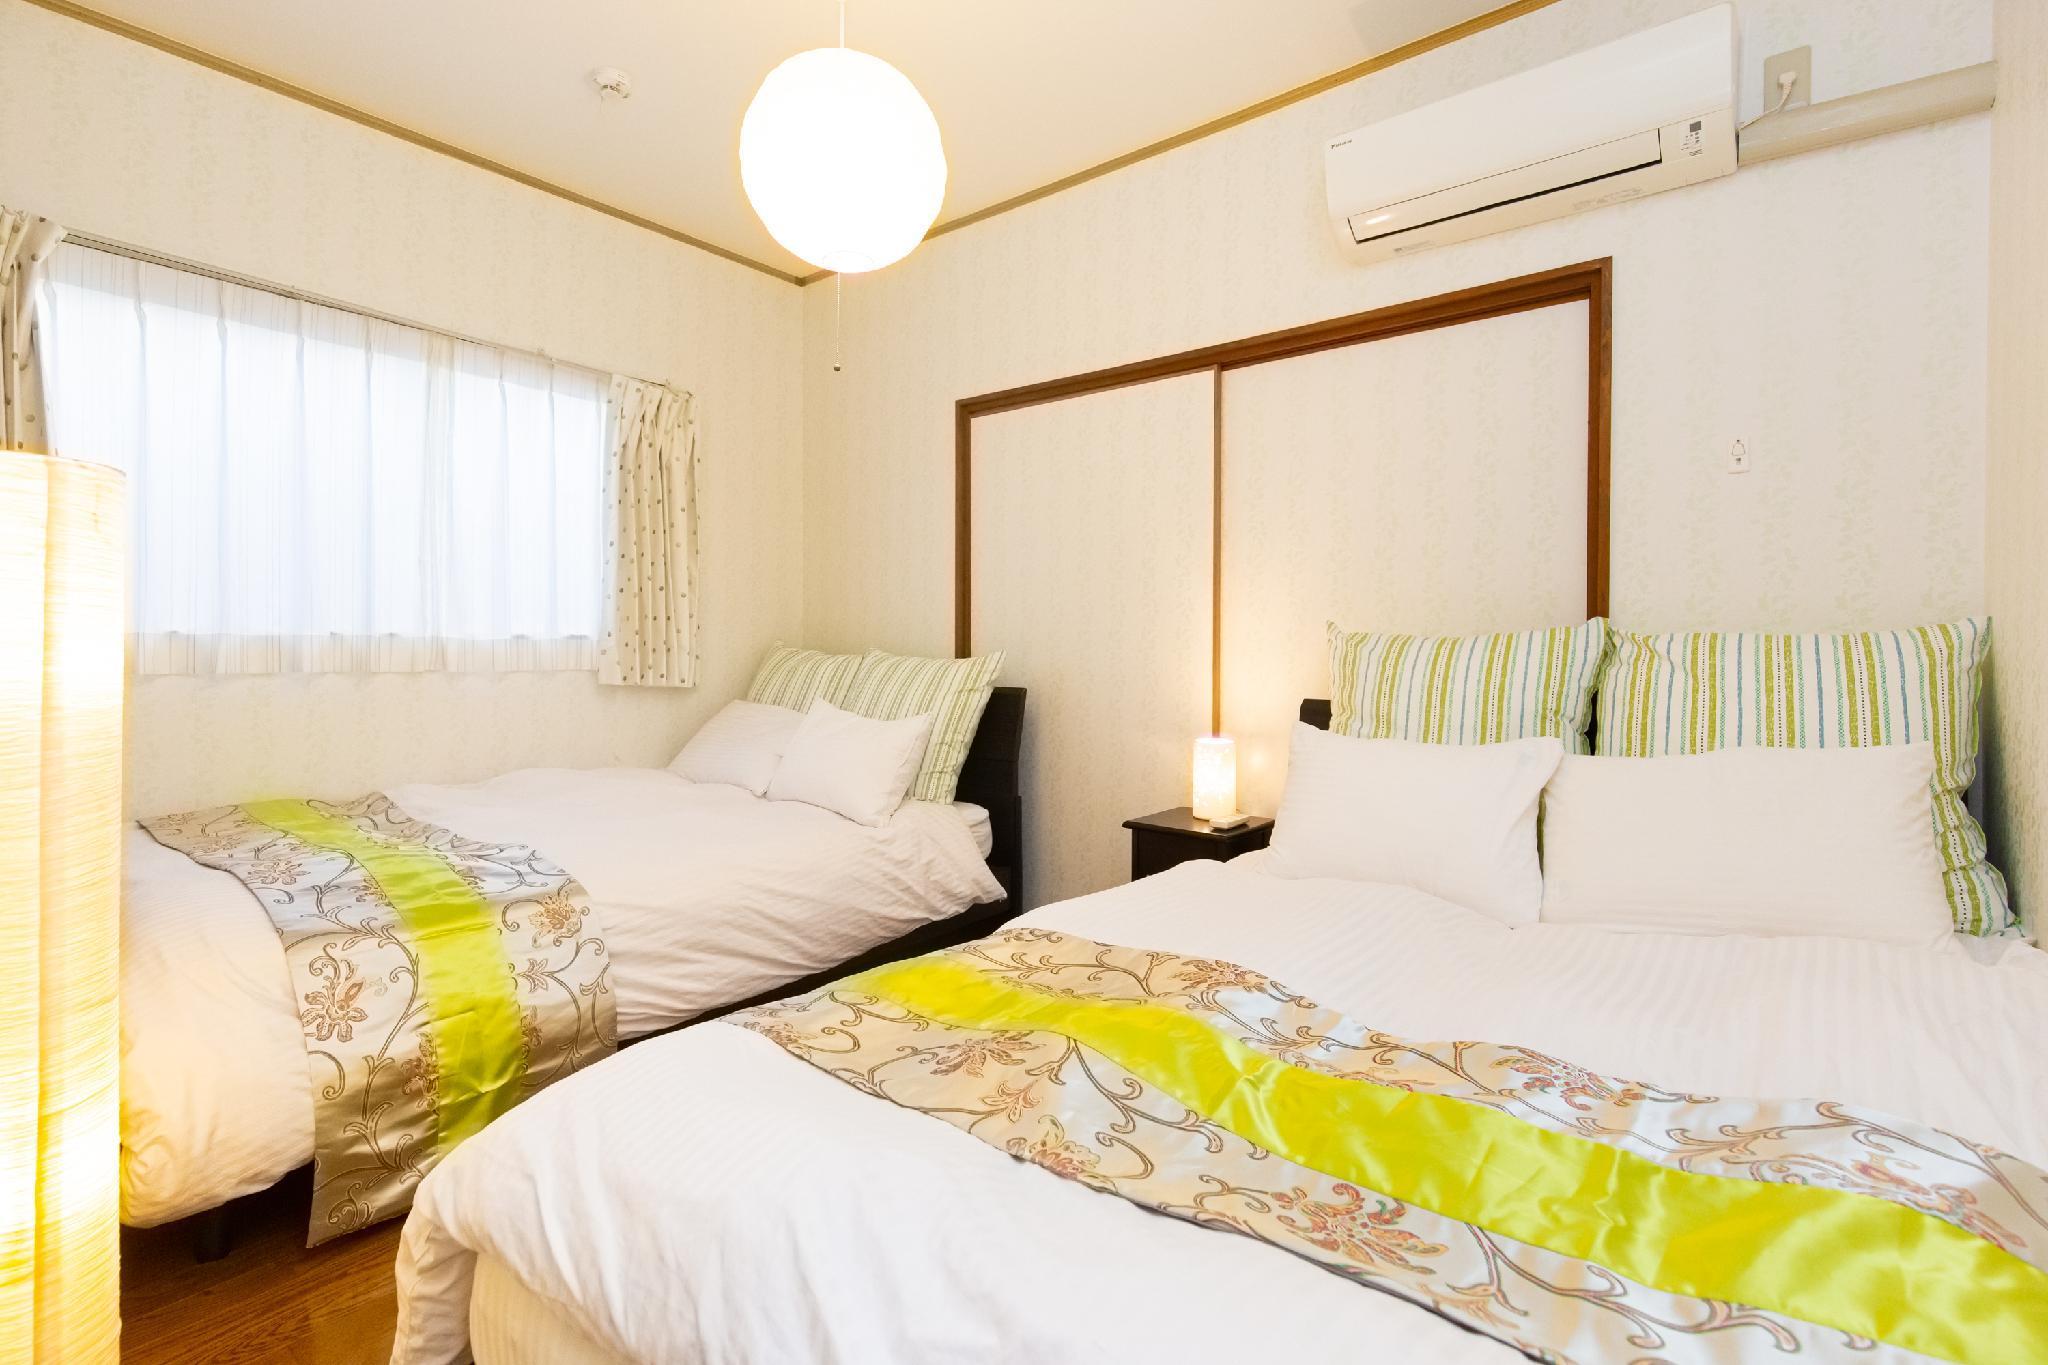 FMC 29968812 Guest House Osaka Castle